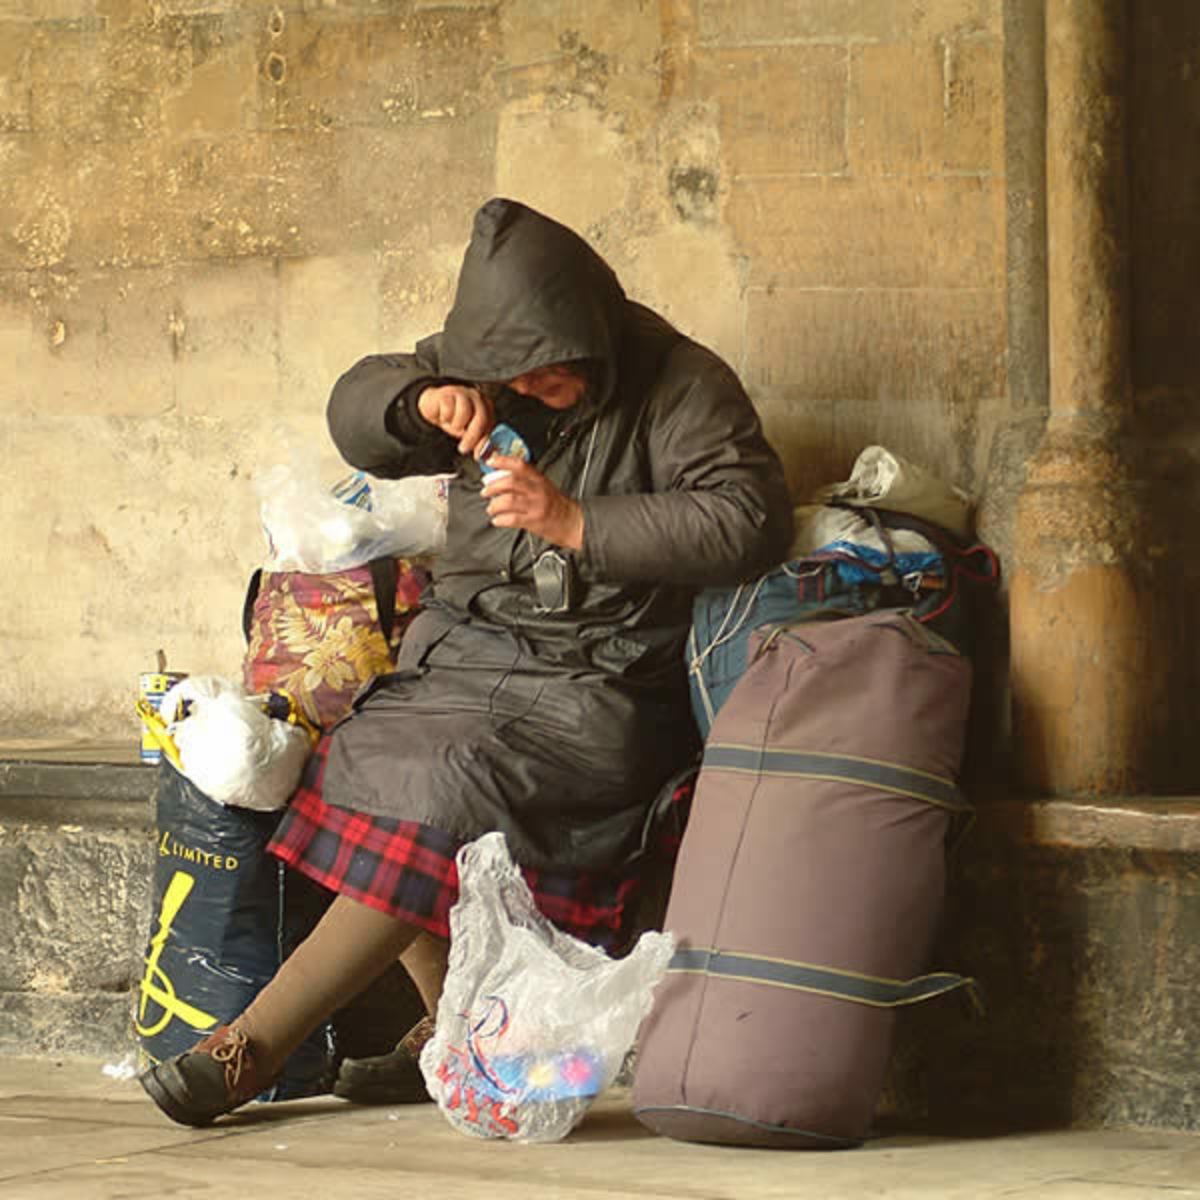 Fear of Homelessness